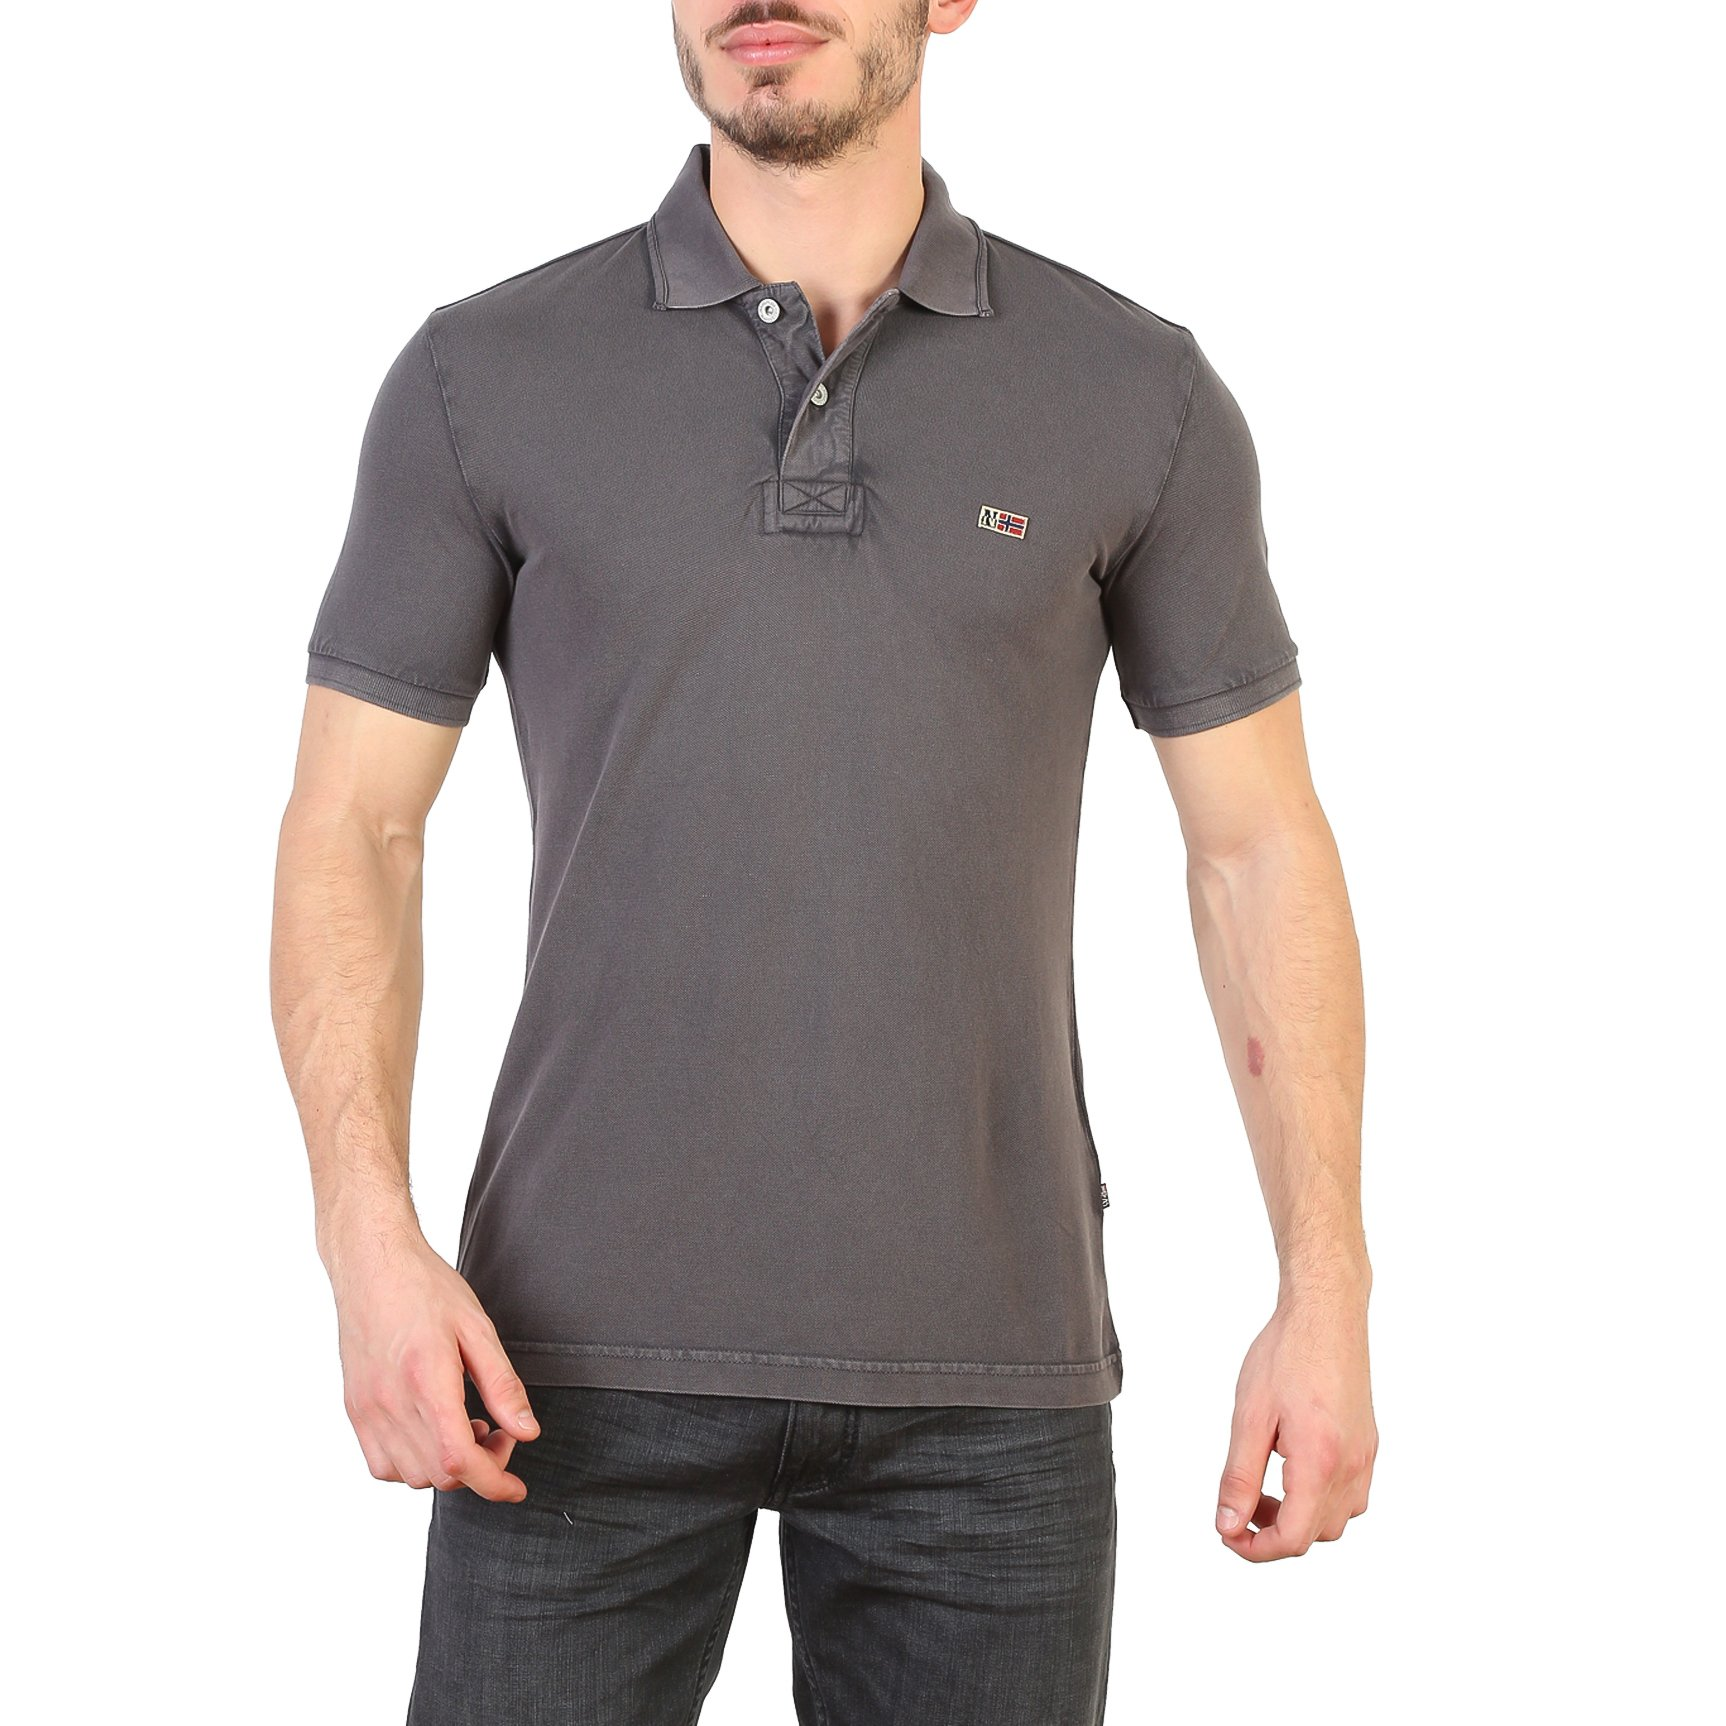 Napapijri Men's Polo Shirt Various Colours N0YHDX - grey S